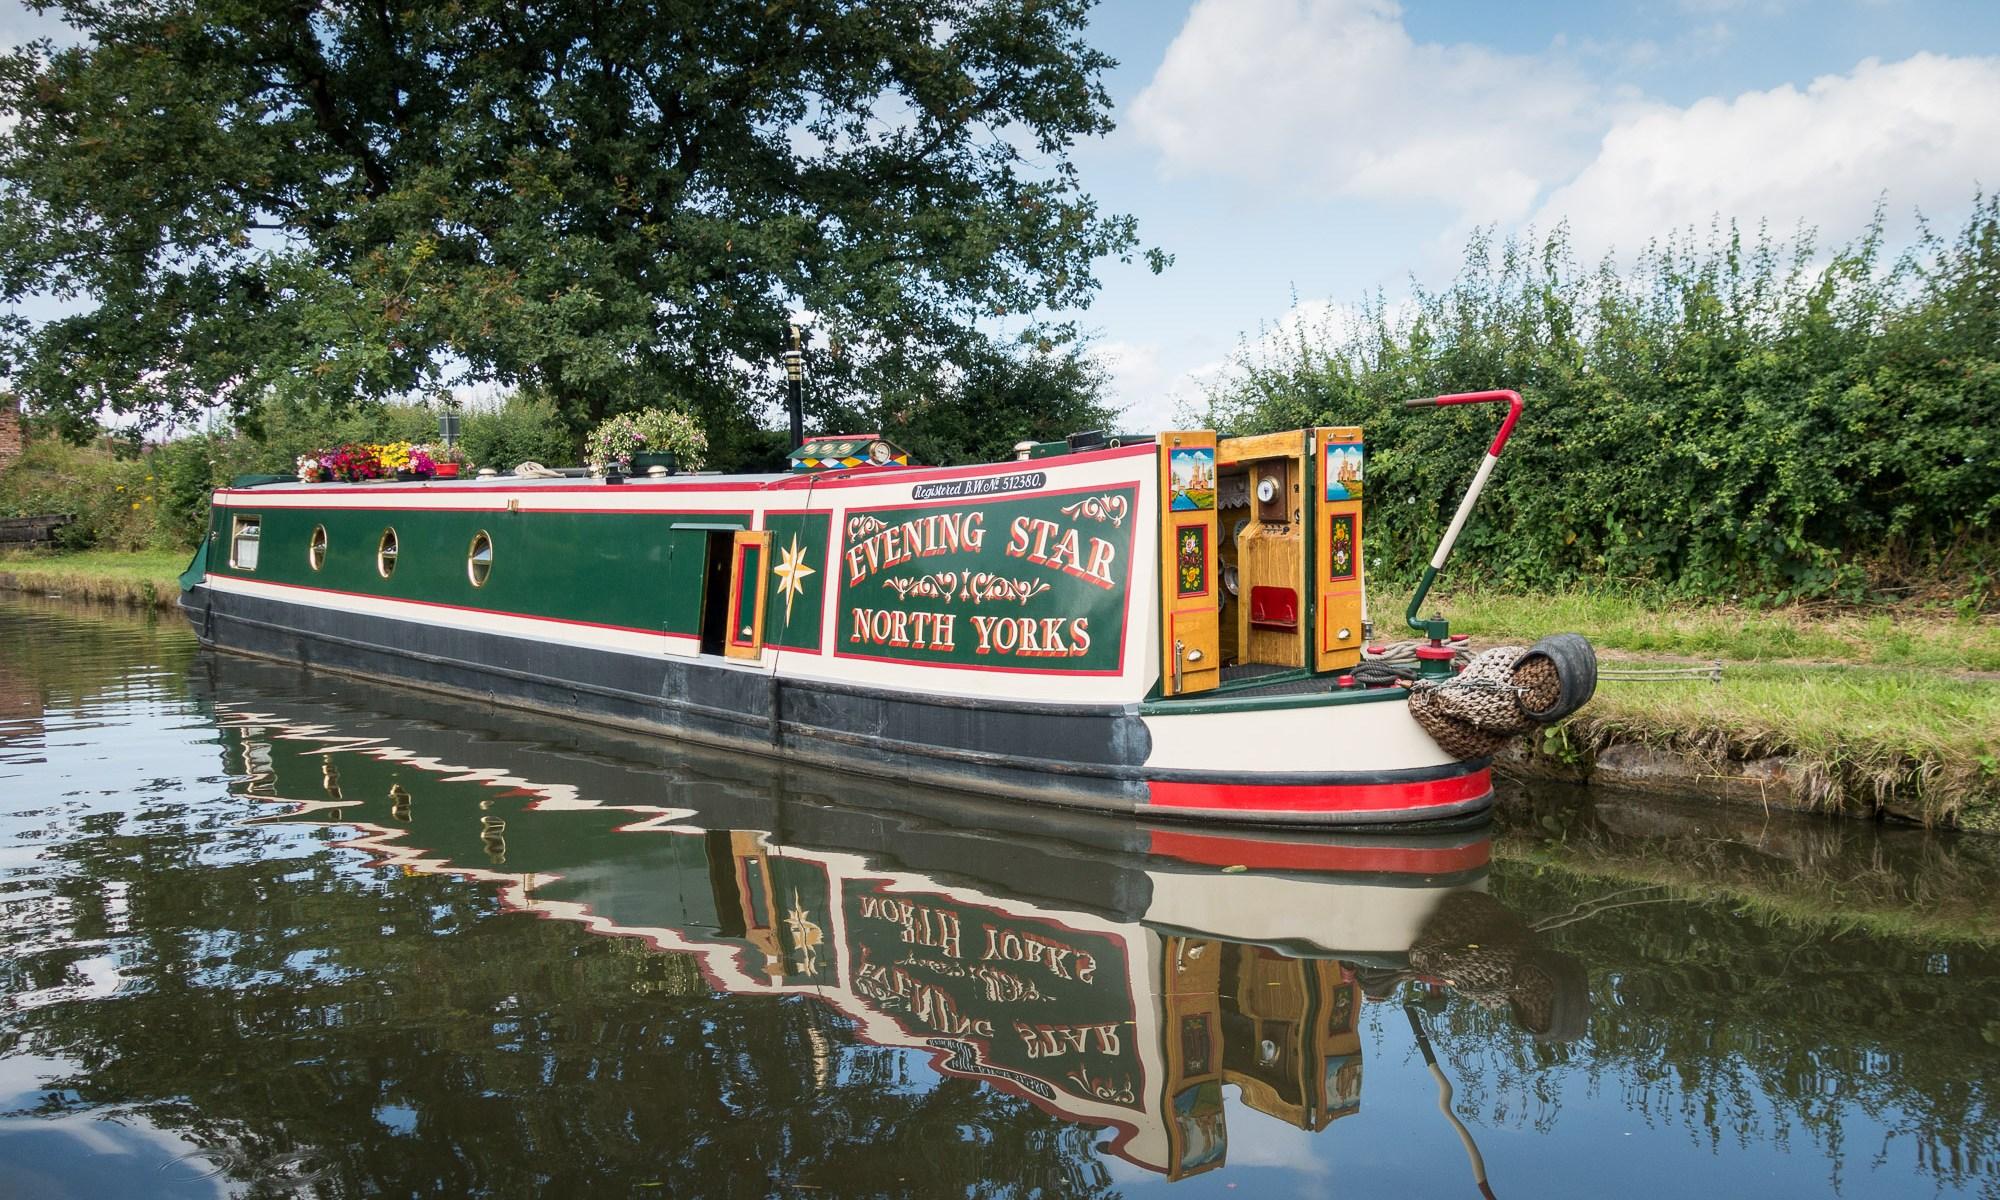 Narrowboat on the bridgewater canal